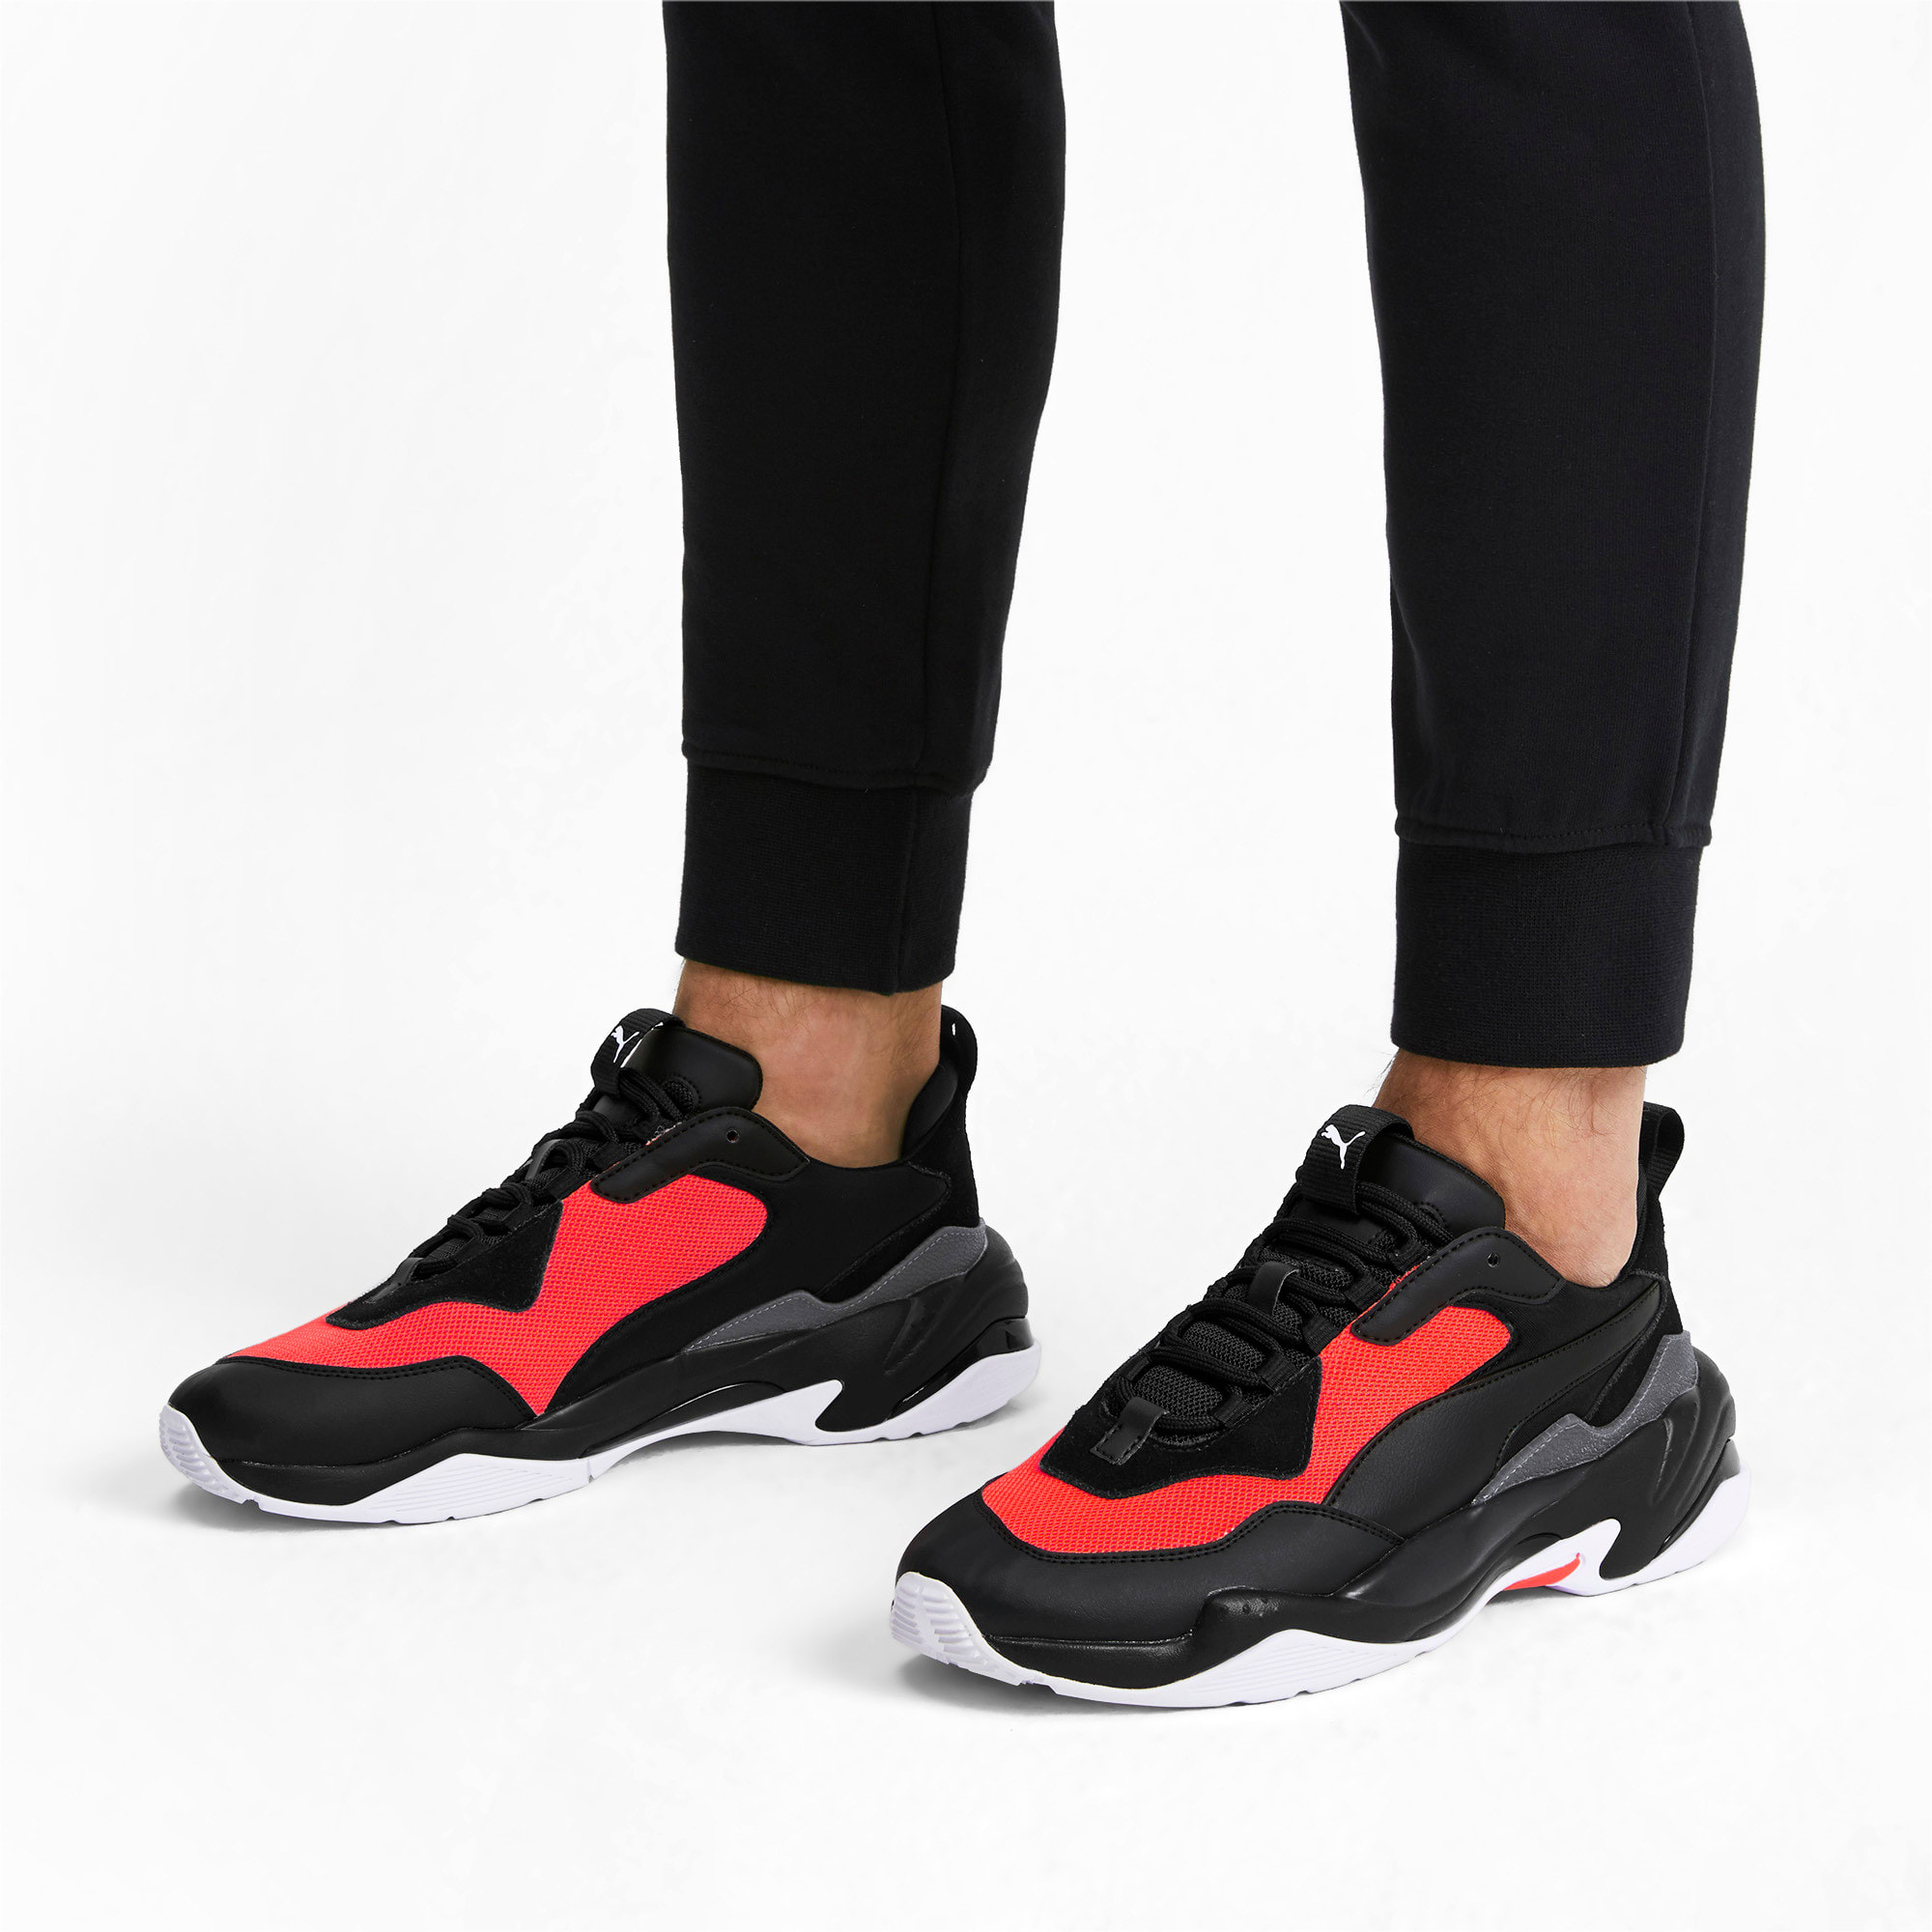 Thumbnail 2 of Thunder Fashion 2.0 sportschoenen, Puma Black-Nrgy Red, medium